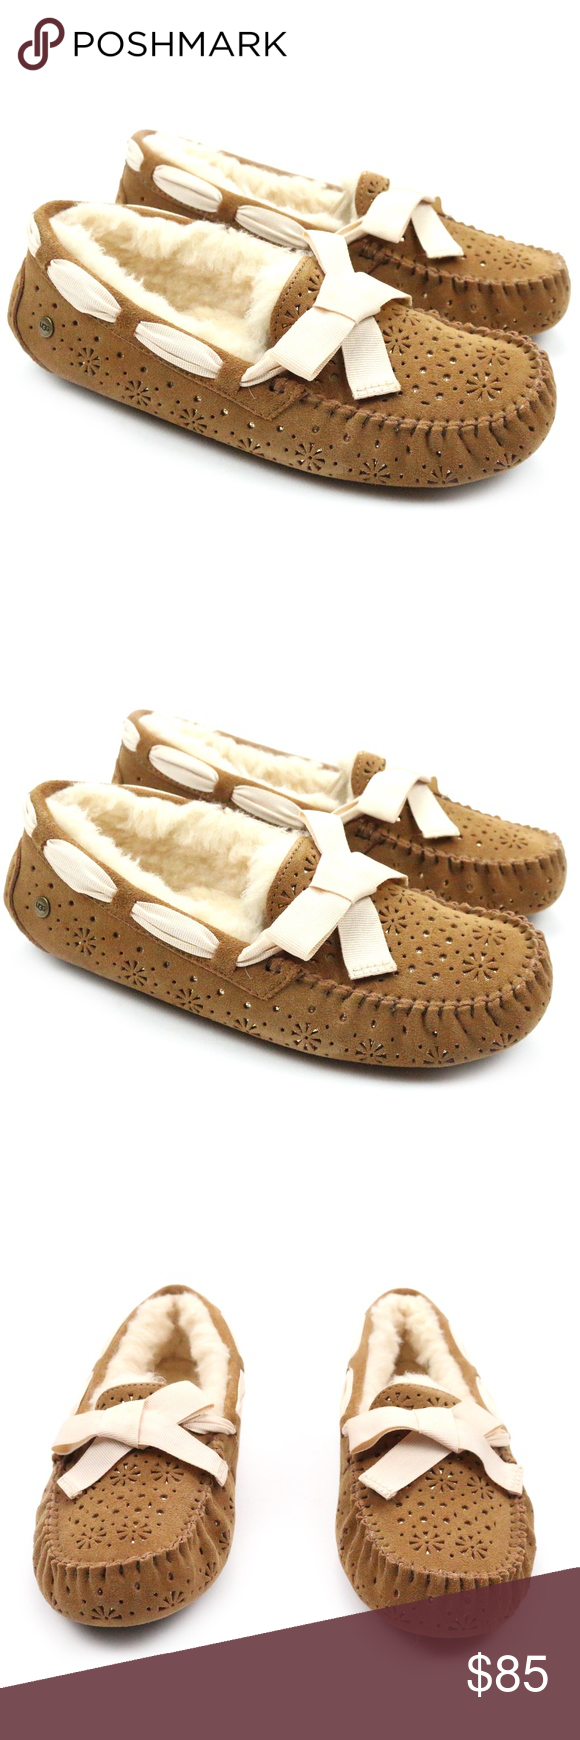 9c8a9736722 UGG Dakota Sunshine Perf Chestnut Mocassins NEW! Super cute and cozy ...